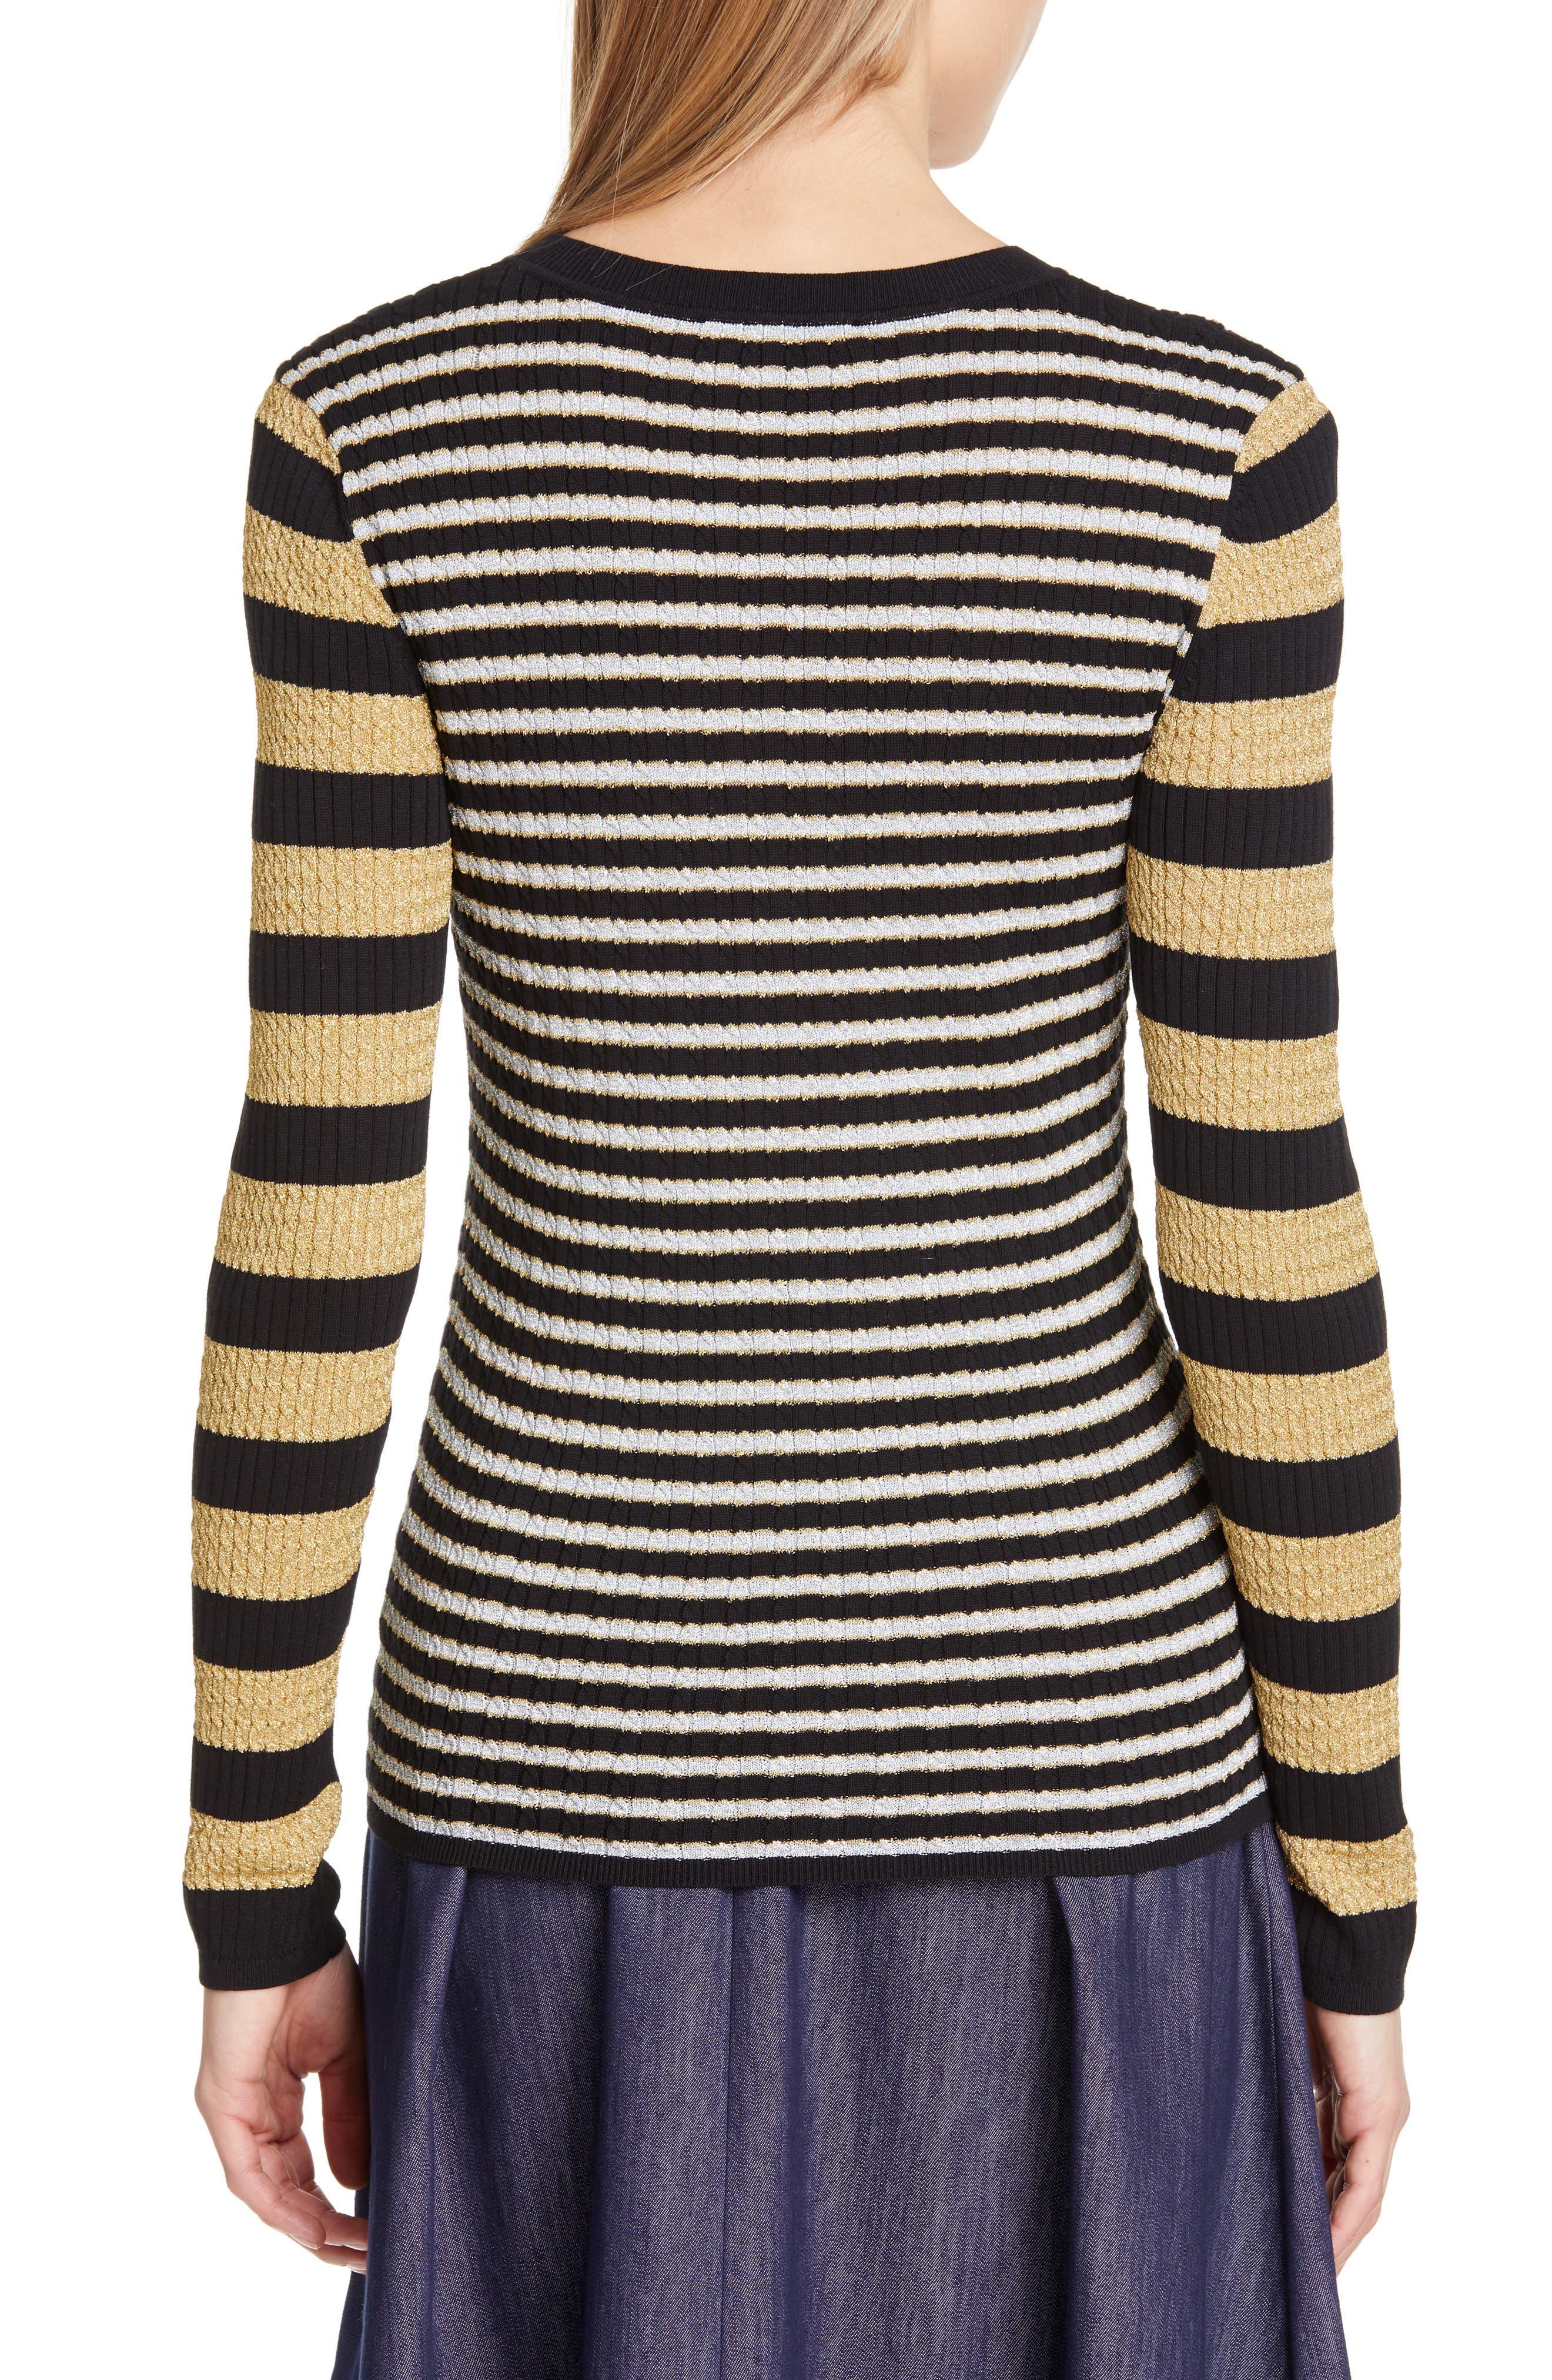 TOMMY X ZENDAYA, Metallic Stripe Knit Top, Alternate thumbnail 2, color, BLACK BEAUTY MULTI